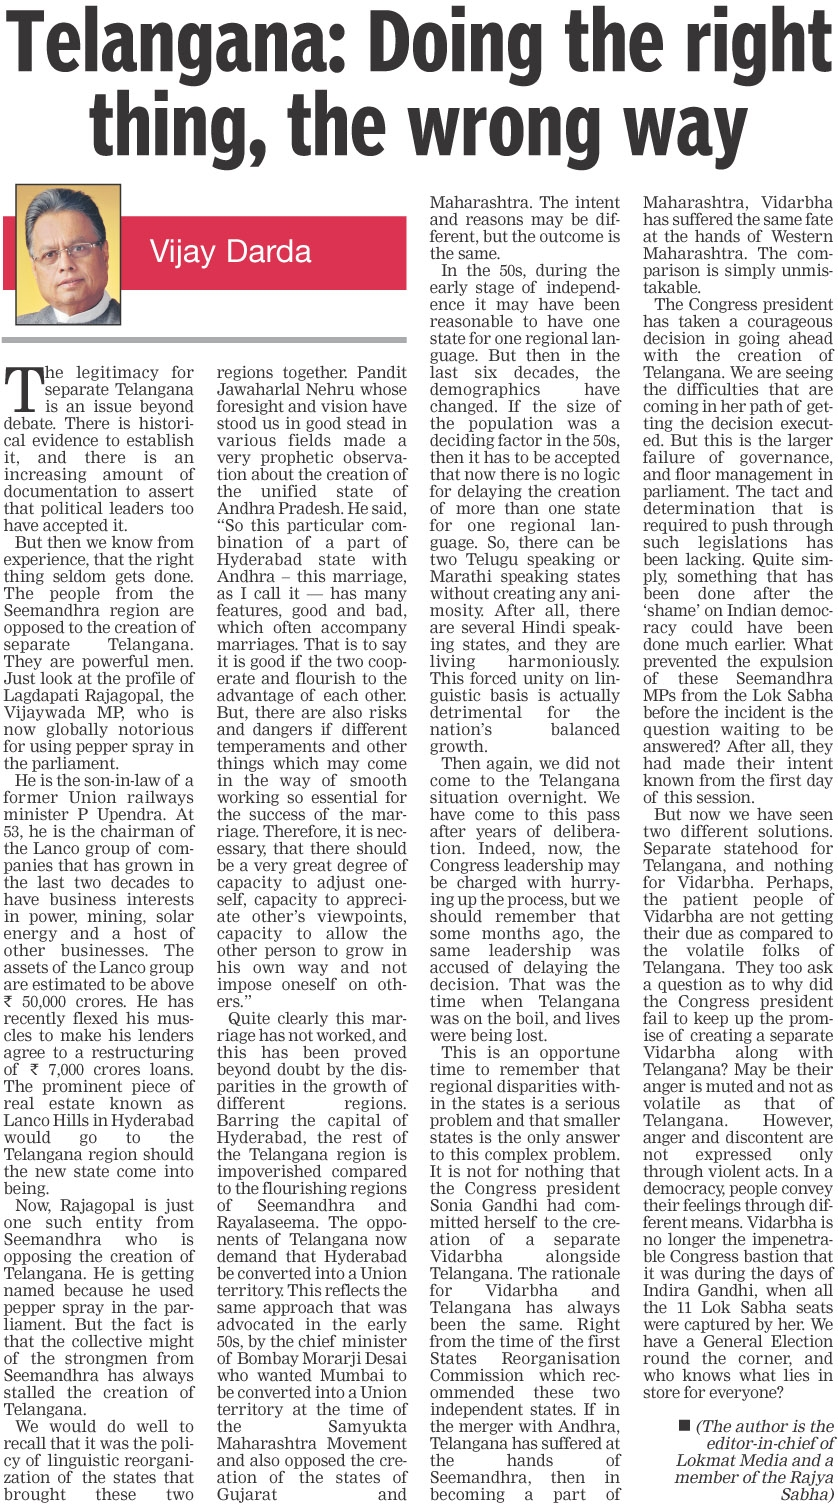 Telangana: Doing the right thing, the wrong way